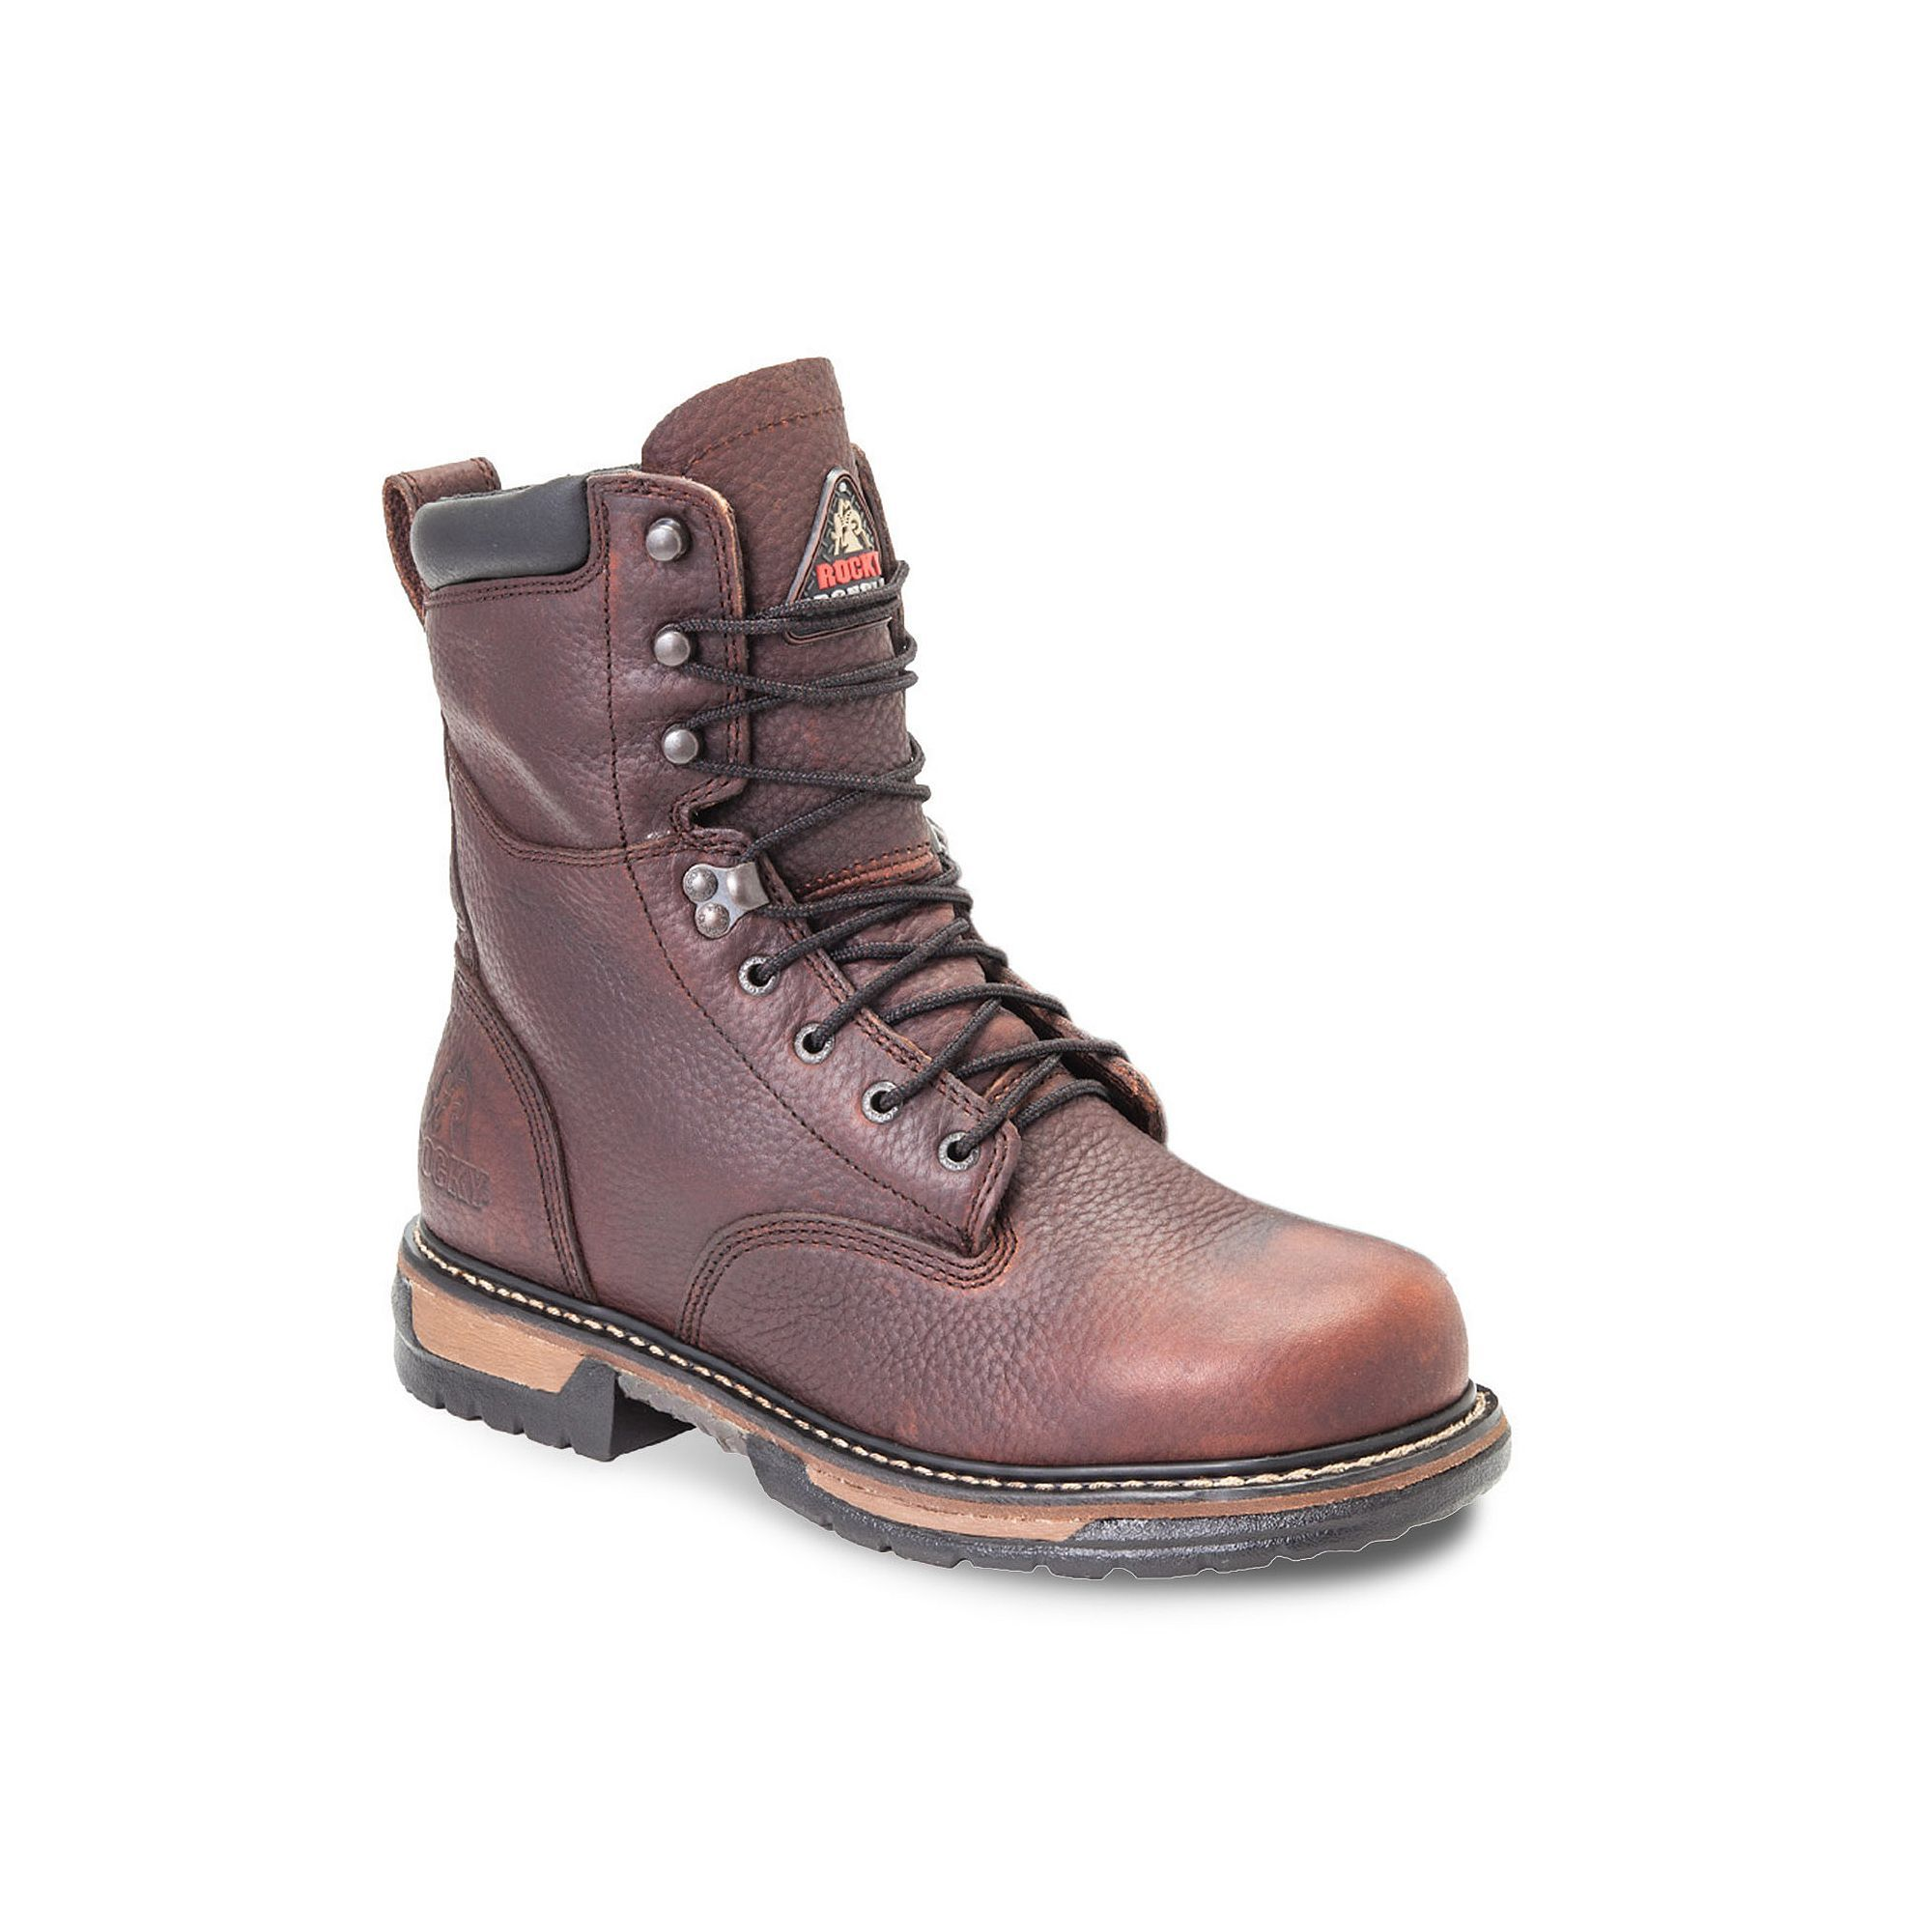 HUGO BOSS Men's Dress Appeal Leather Chelsea Boots - Medium Brown - UK 8 K3mOy4Fv